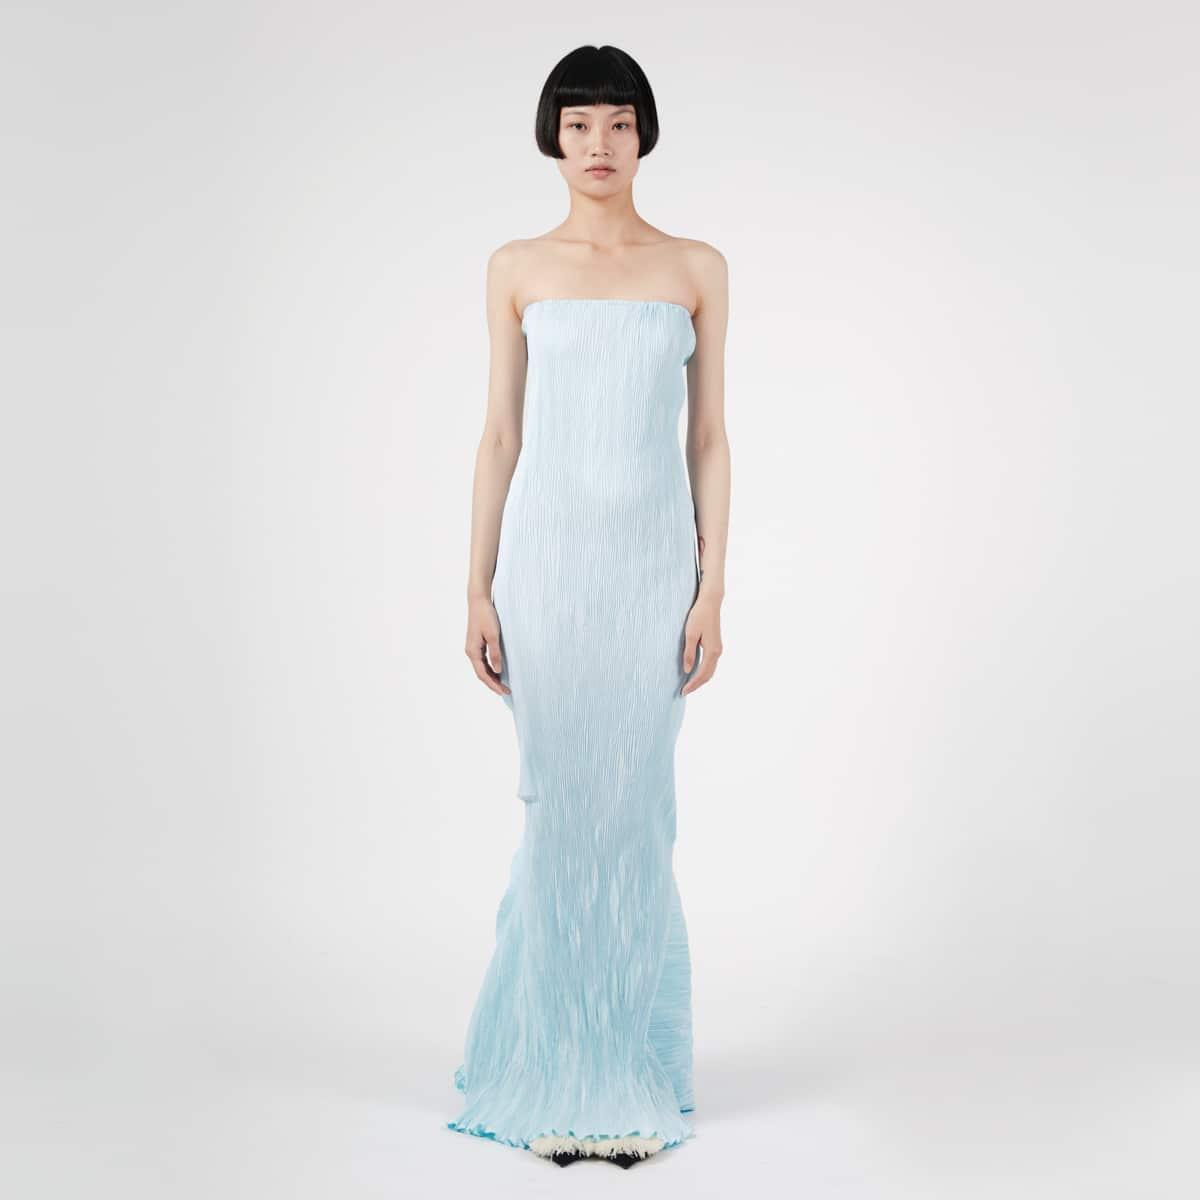 Peet Dullaert Techno Pleat Sculptured Dress